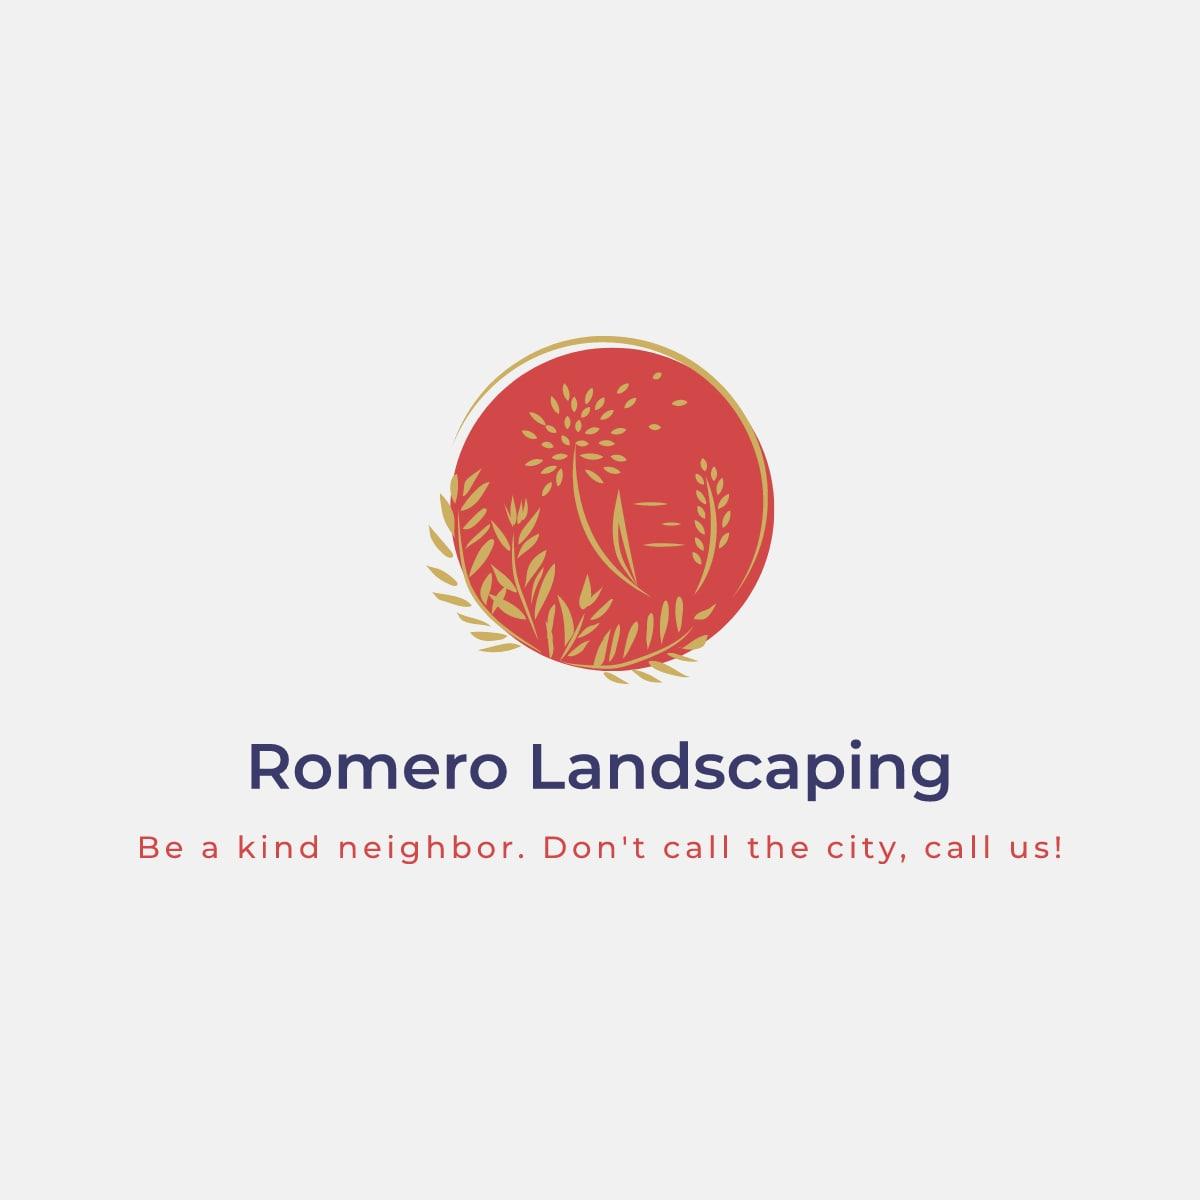 Romero Landscaping